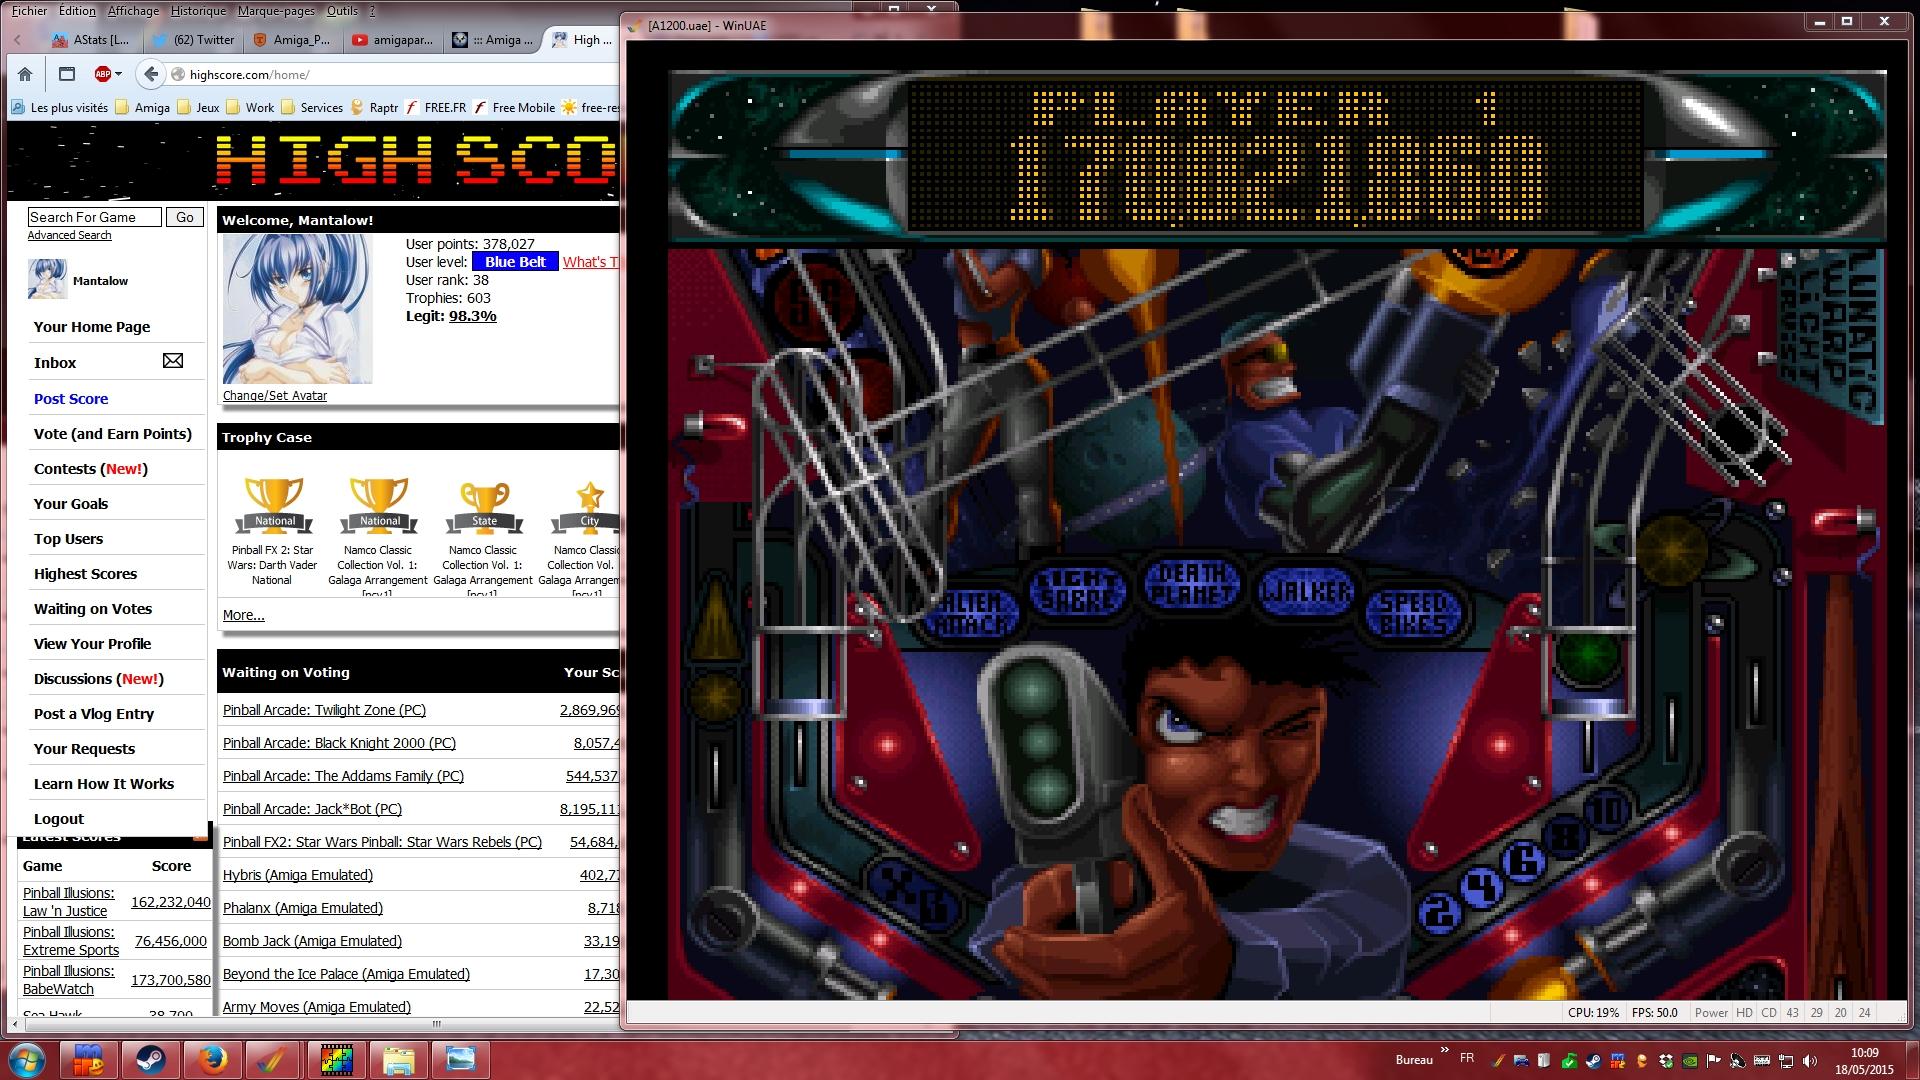 Mantalow: Slam Tilt: Ace of Space (Amiga Emulated) 170,021,860 points on 2015-05-18 03:20:04